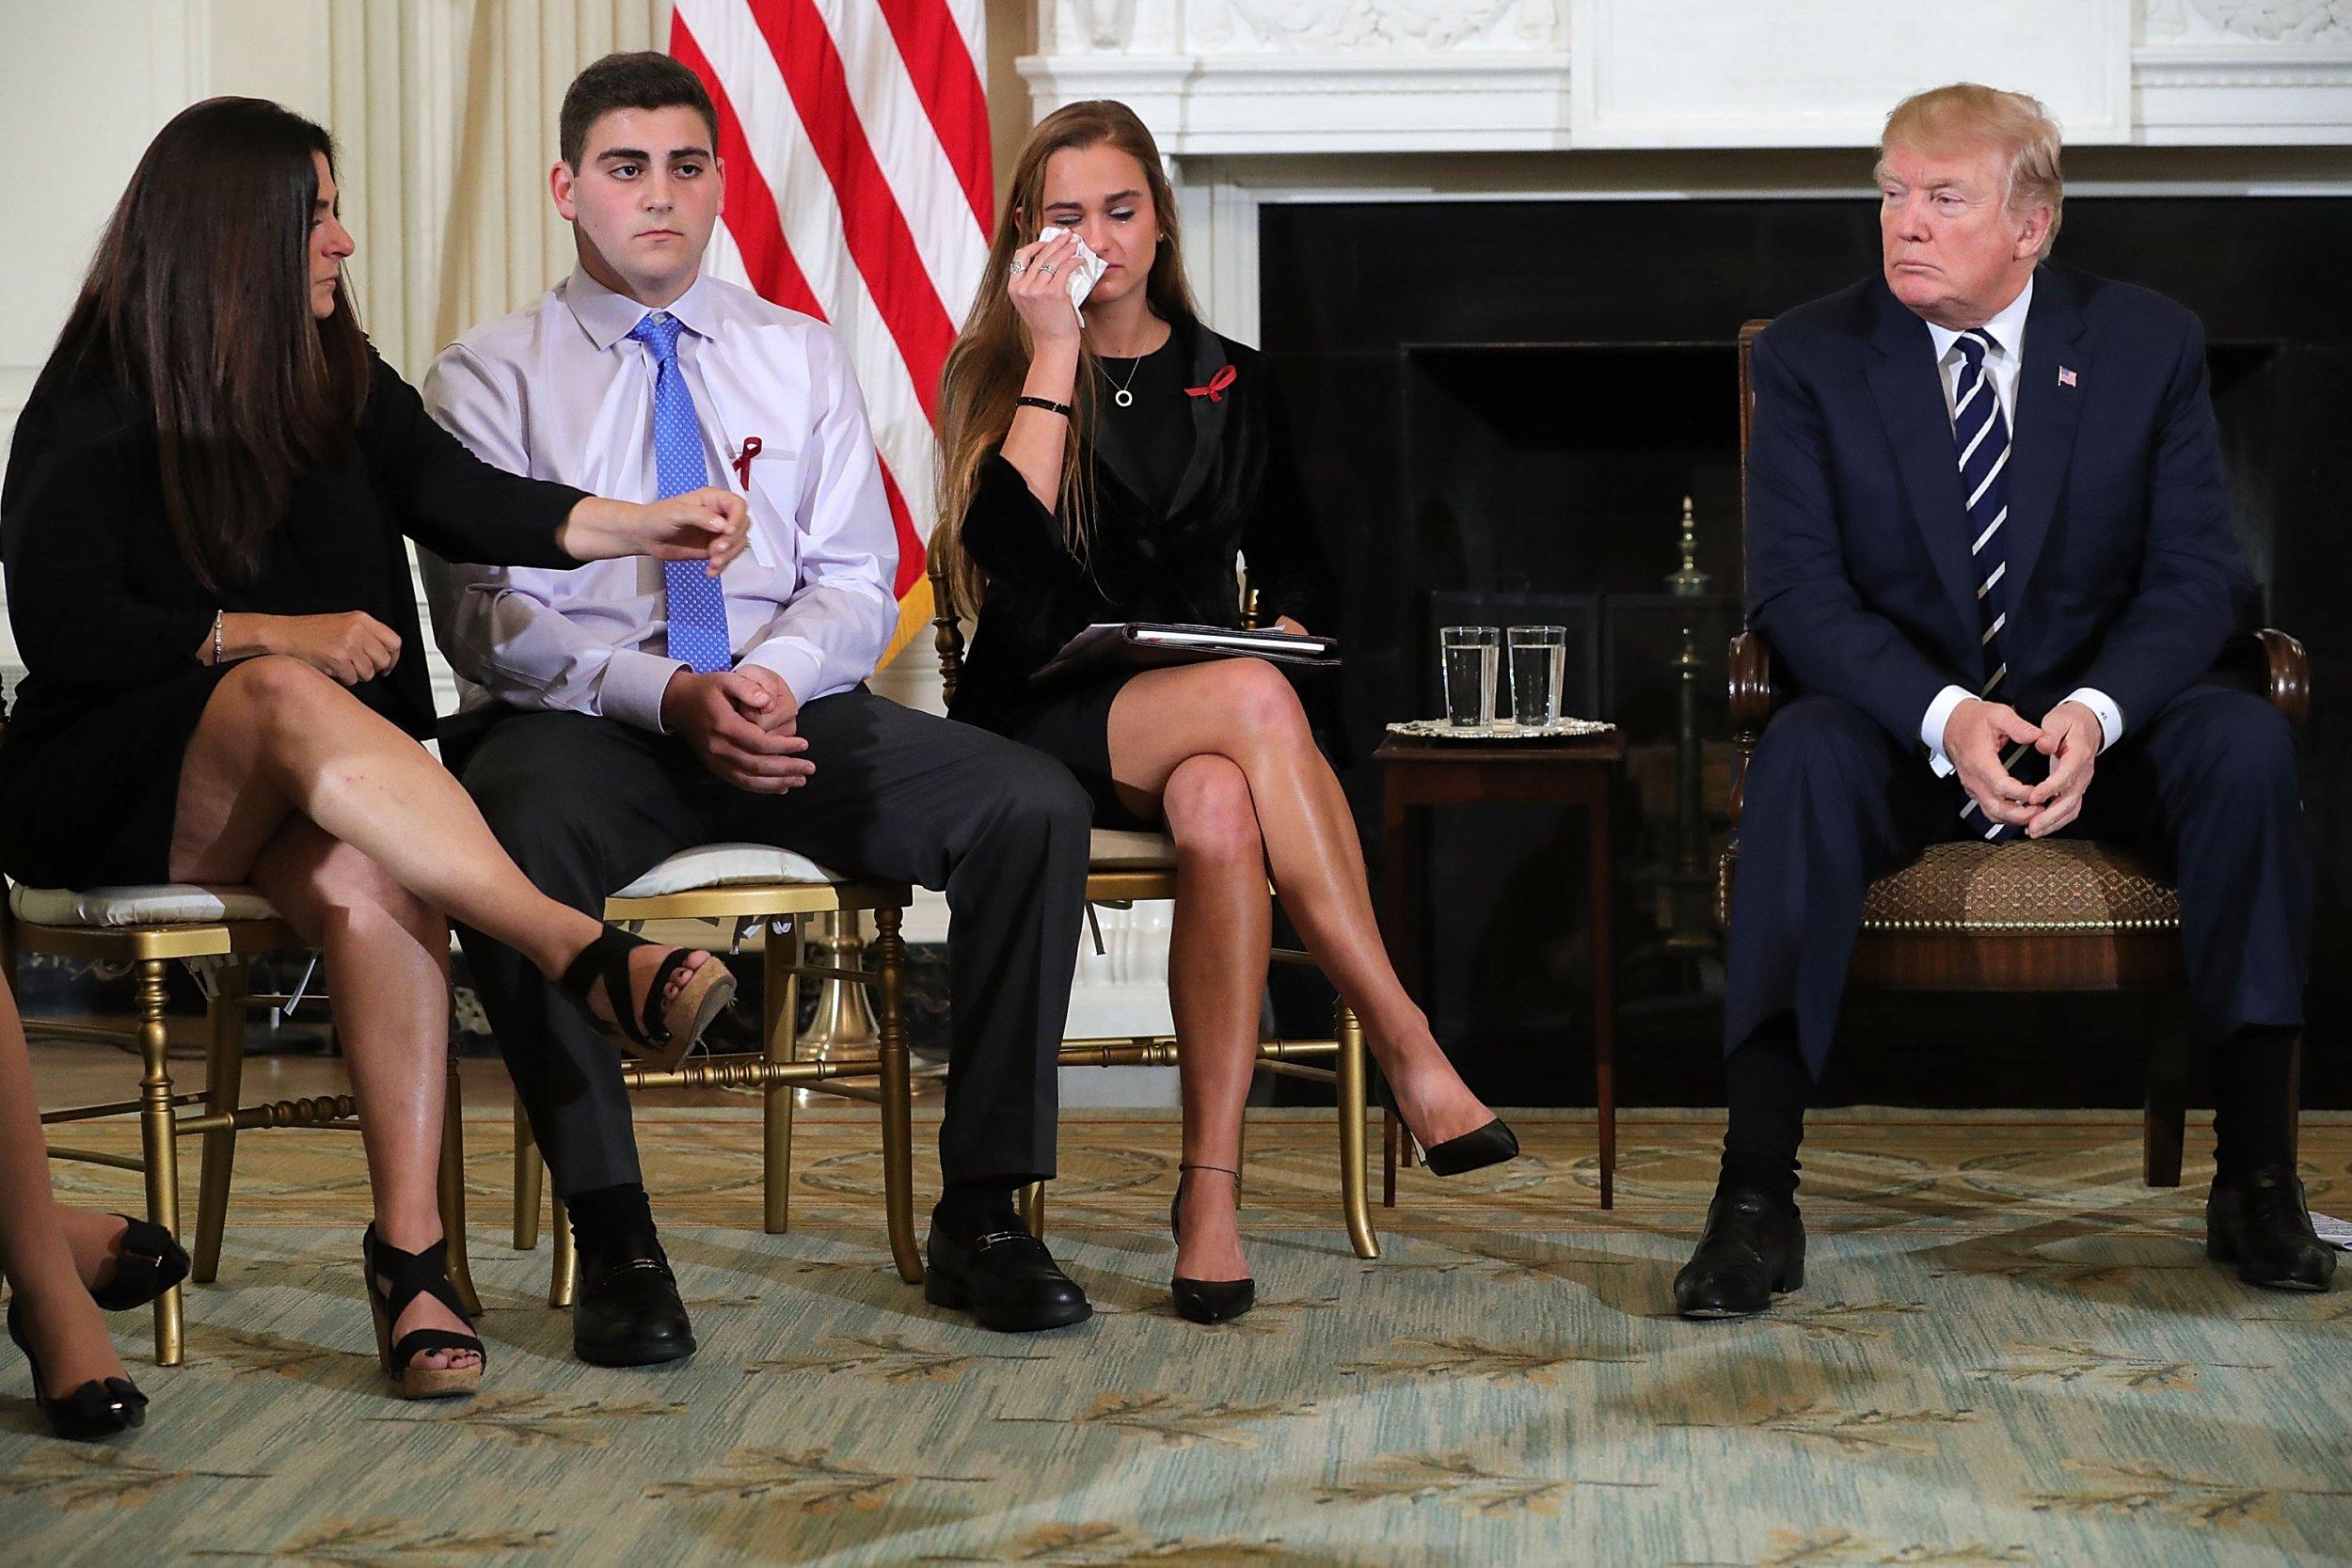 Jared Kushner S Brother Who Opposed Trump Donates To Gun